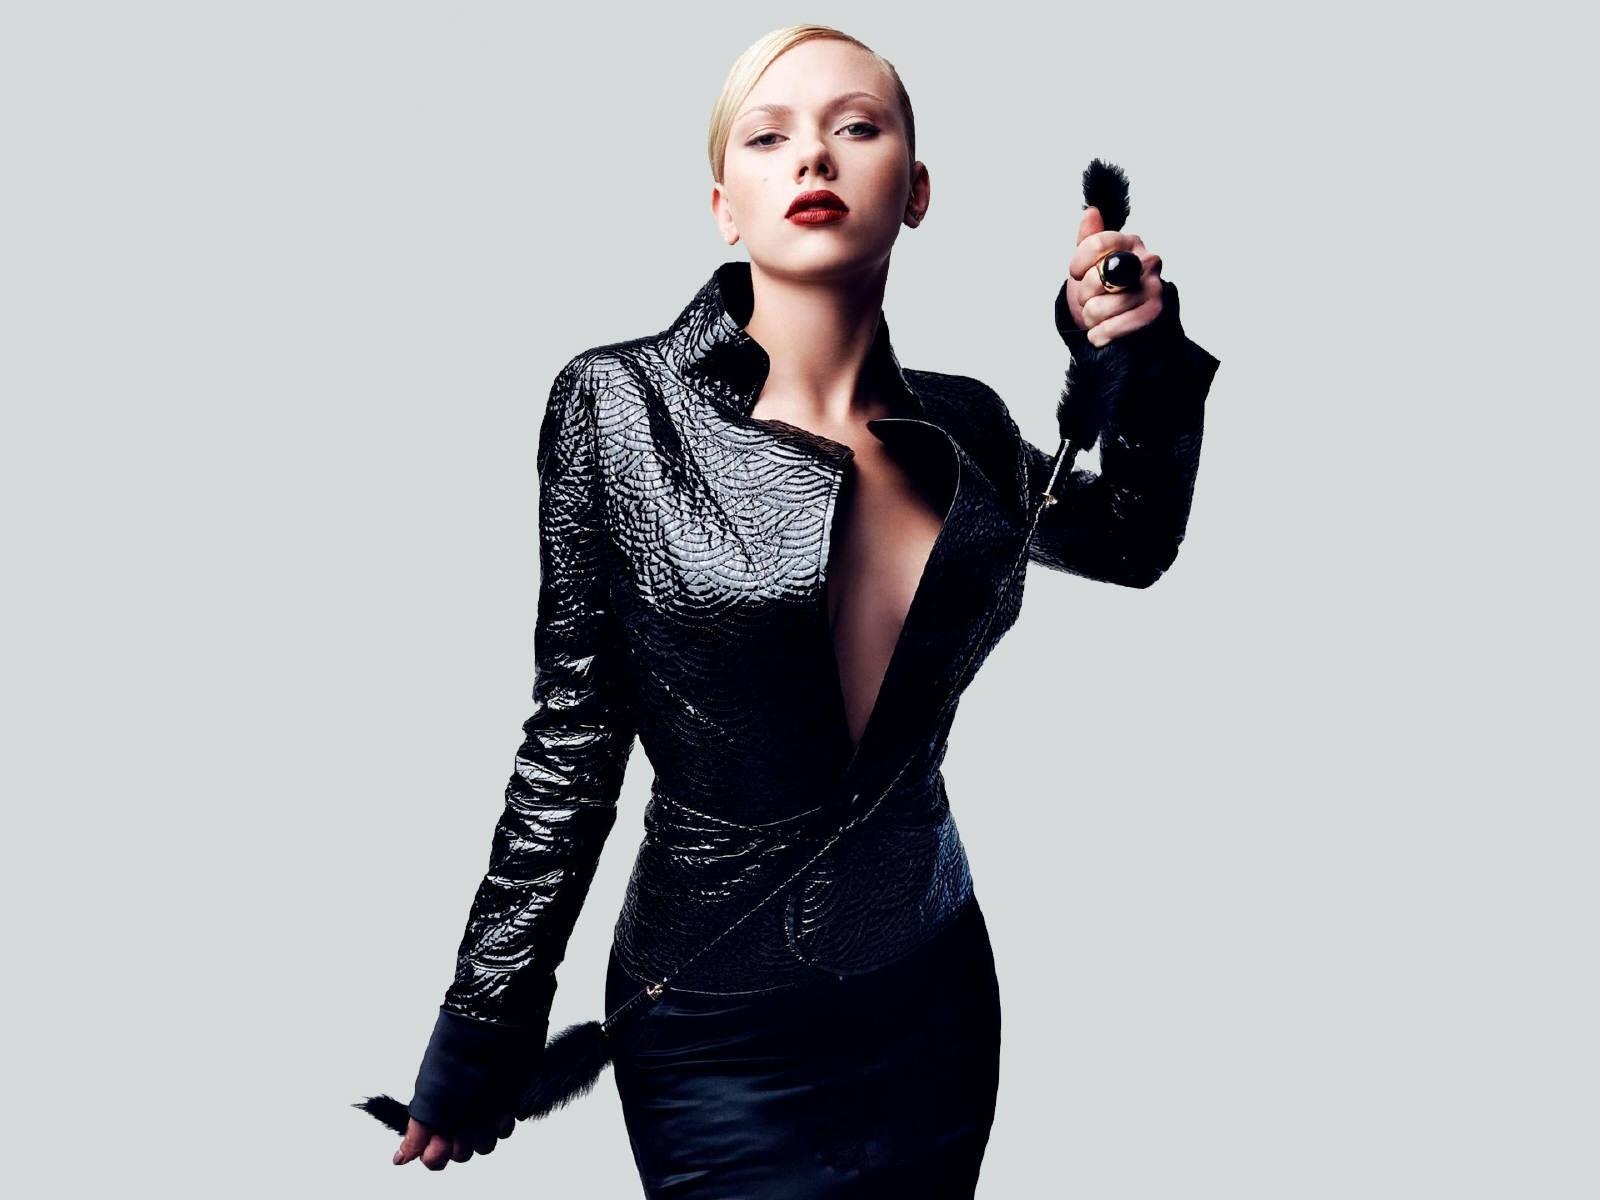 Wallpaper di Scarlett Johansson in total black